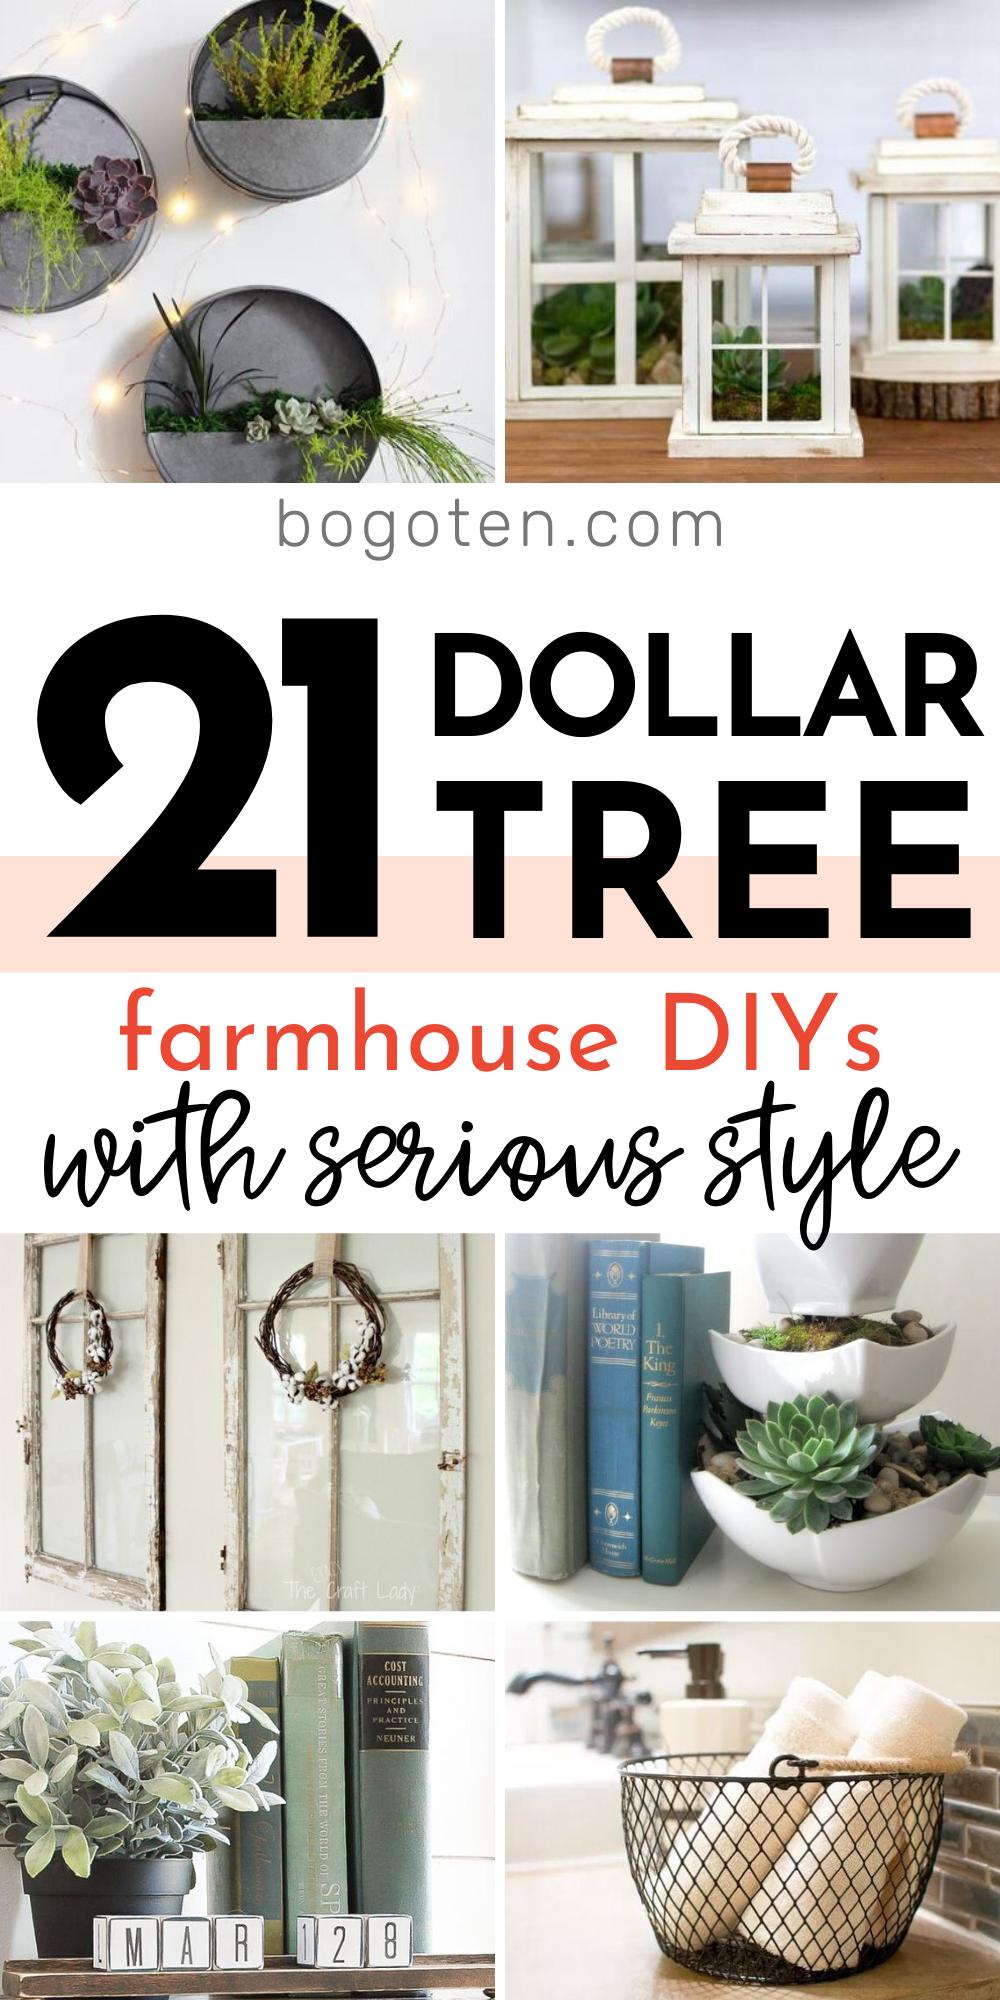 Dollar Tree Farmhouse Diys They Ll Think Cost A Fortune Dollar Store Decor Diy Farmhouse Decoration Dollar Tree Diy Crafts